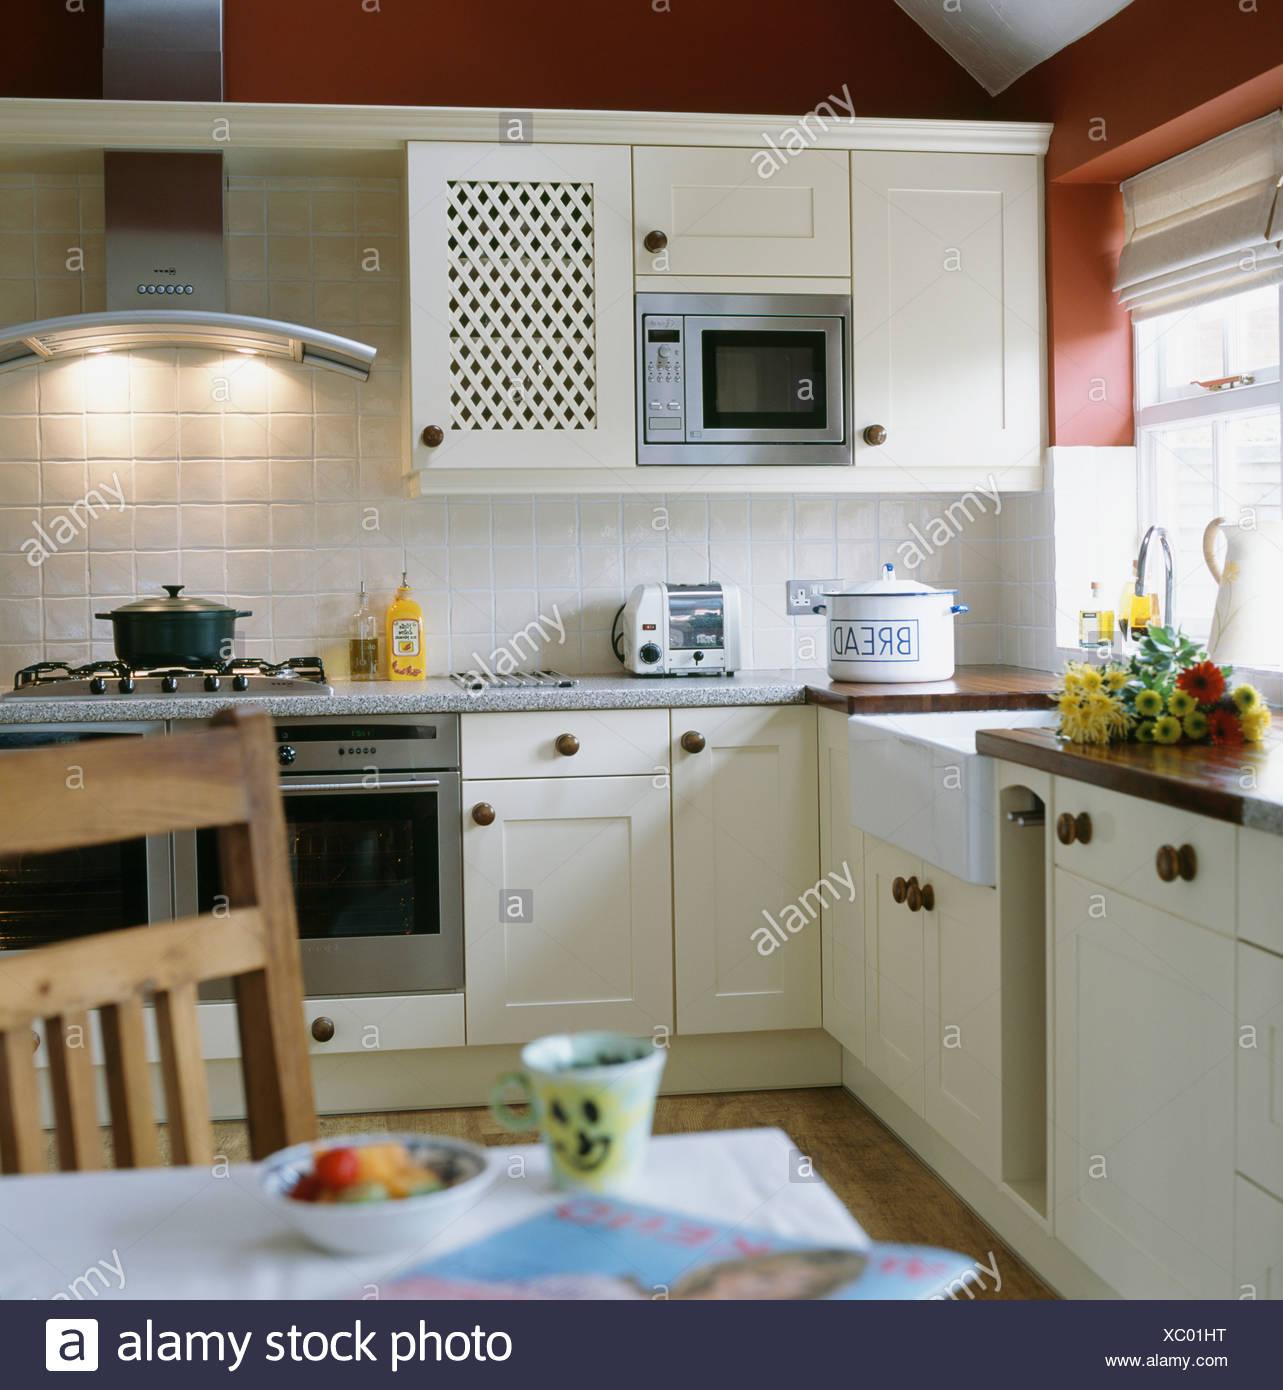 Armadio A Muro Per Cucina.Forno A Microonde Montati In Armadio A Muro In Bianco Cottage Cucina